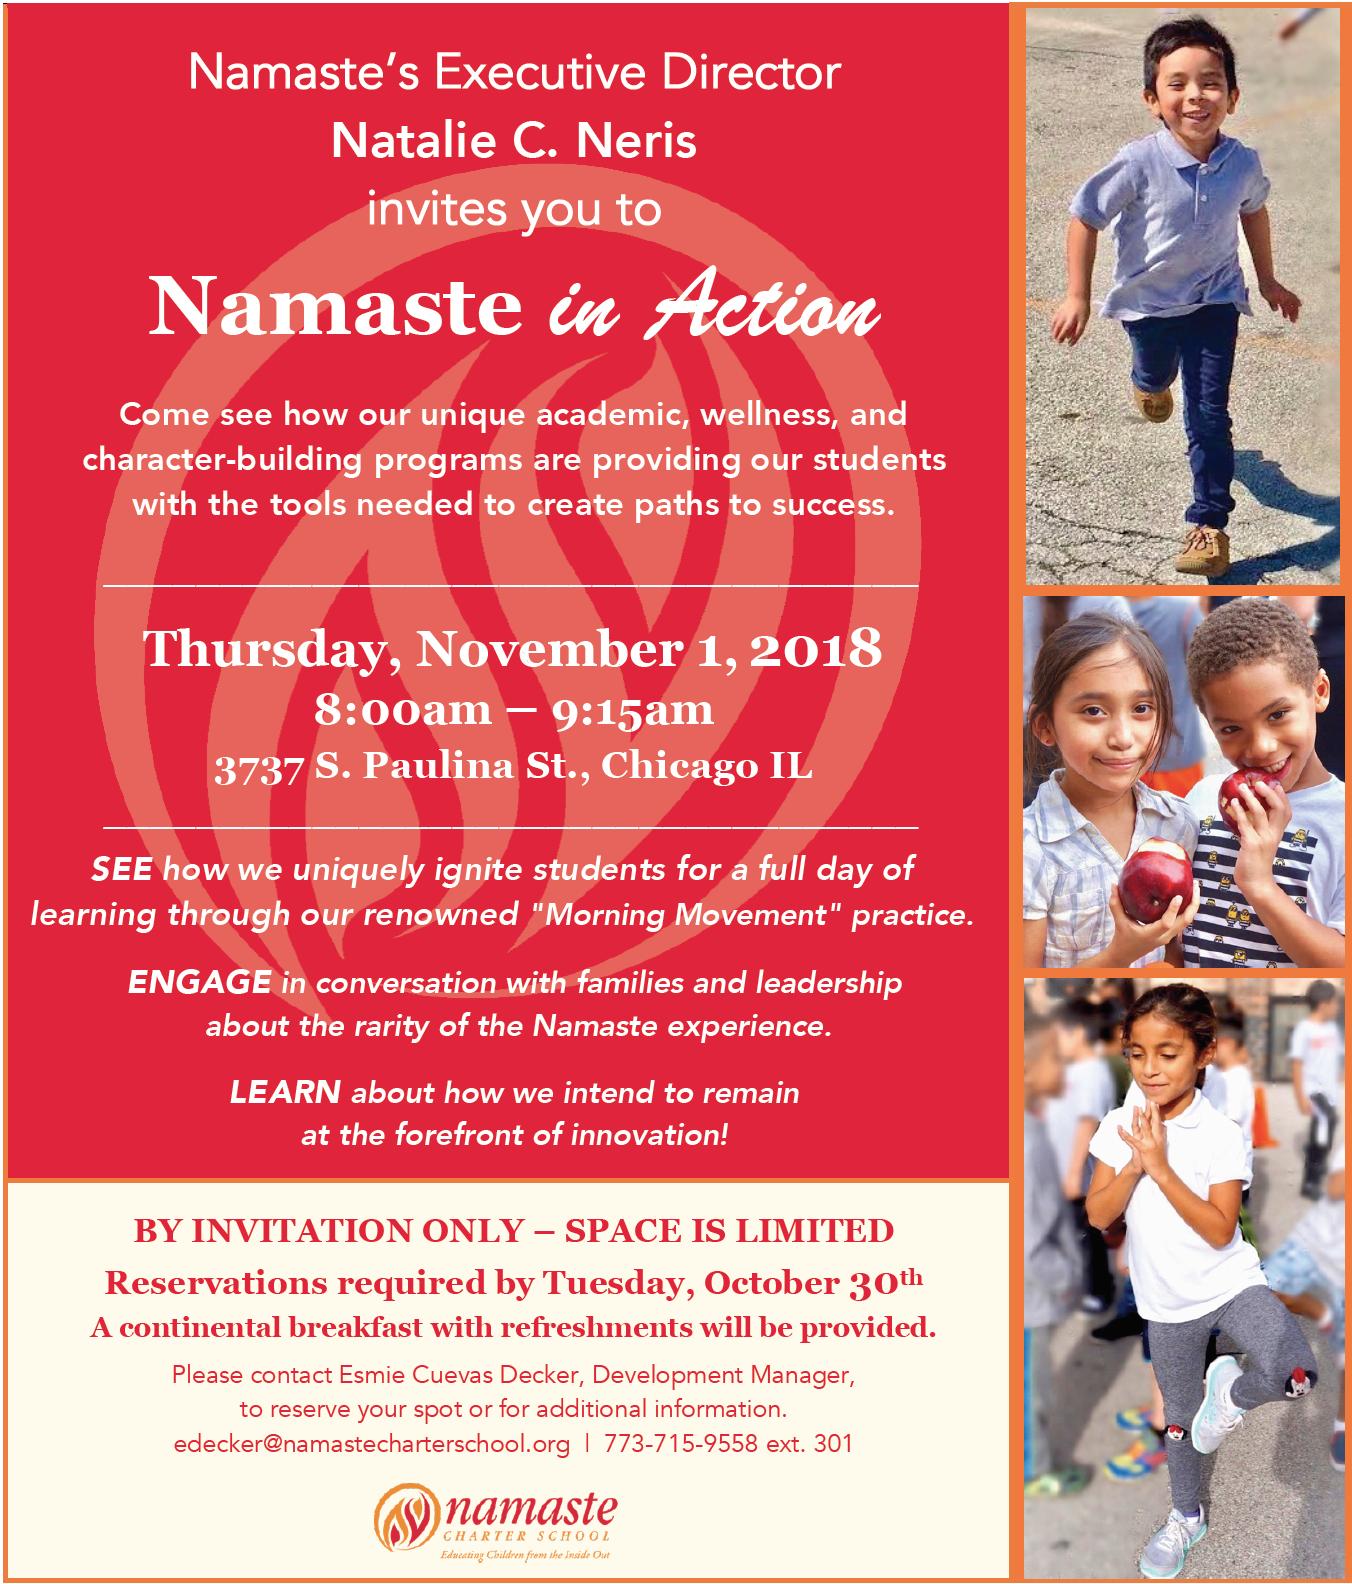 Namaste in Action Evite Nov 2018.png